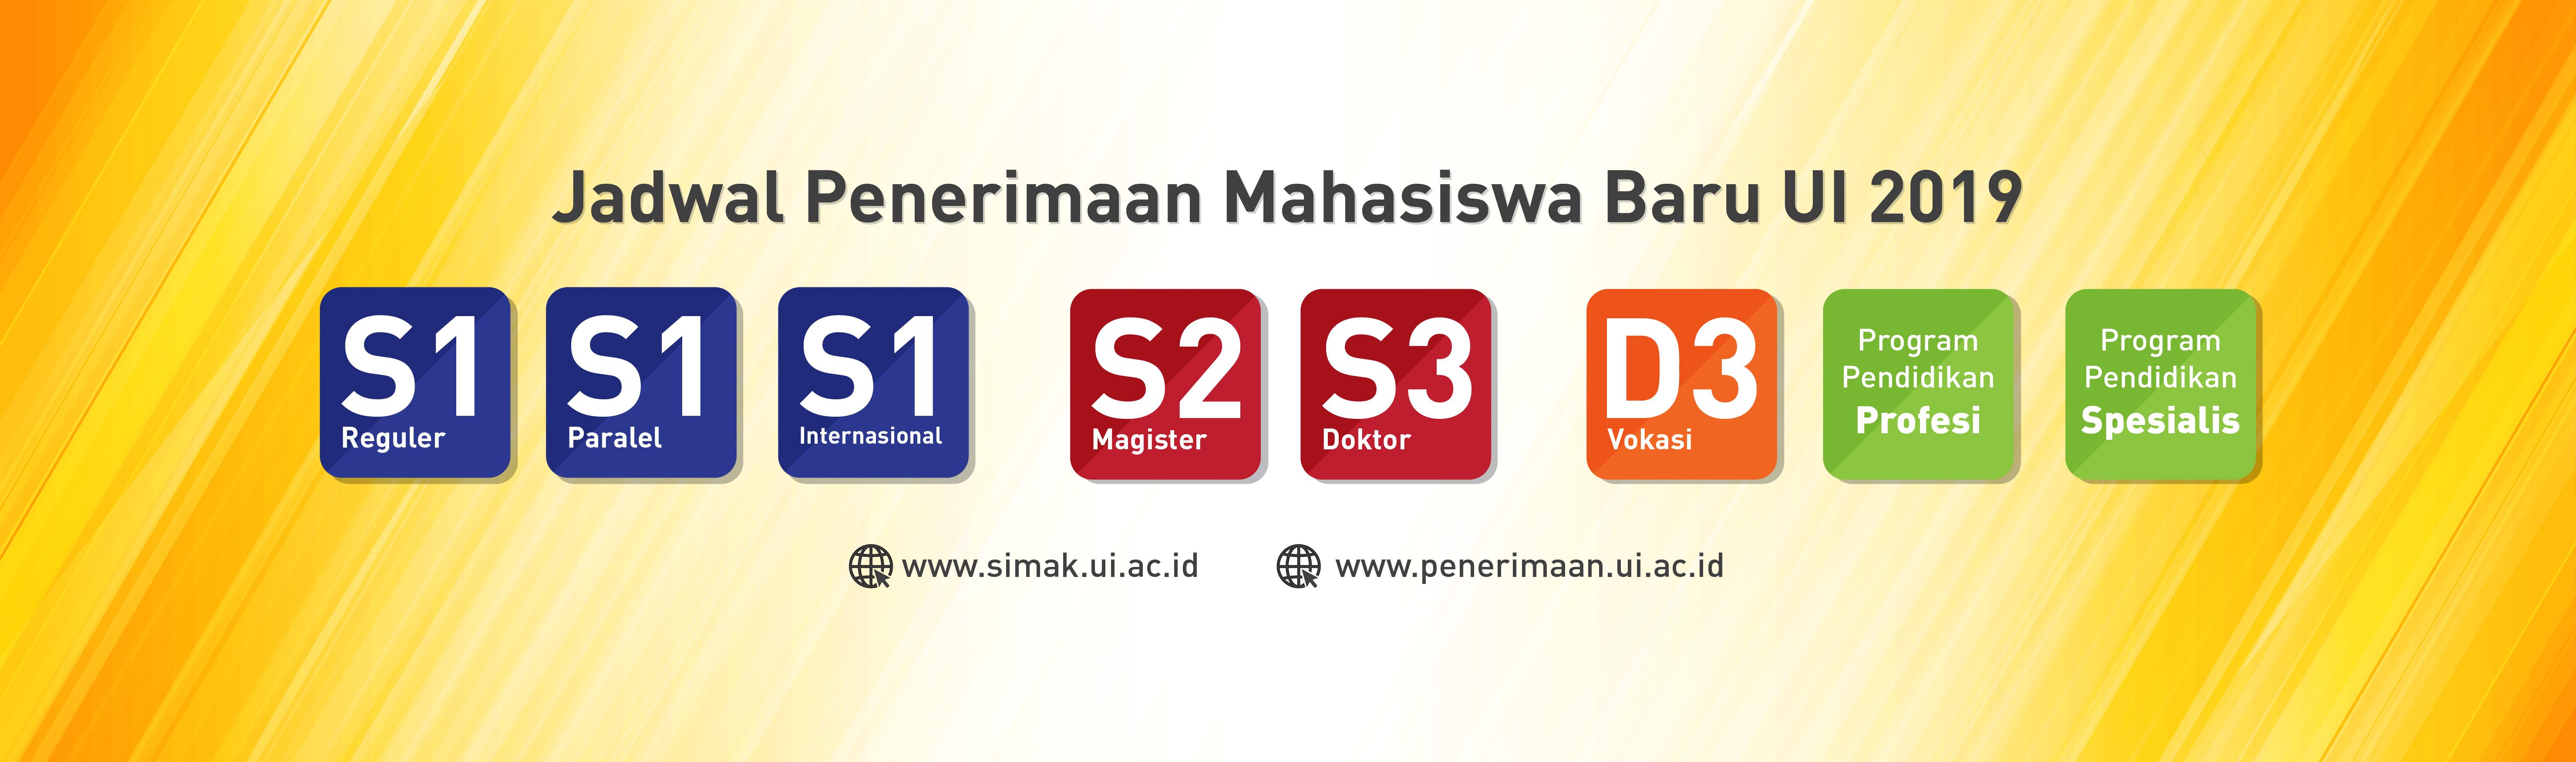 Web-Banner-Penerimaan-UI-01